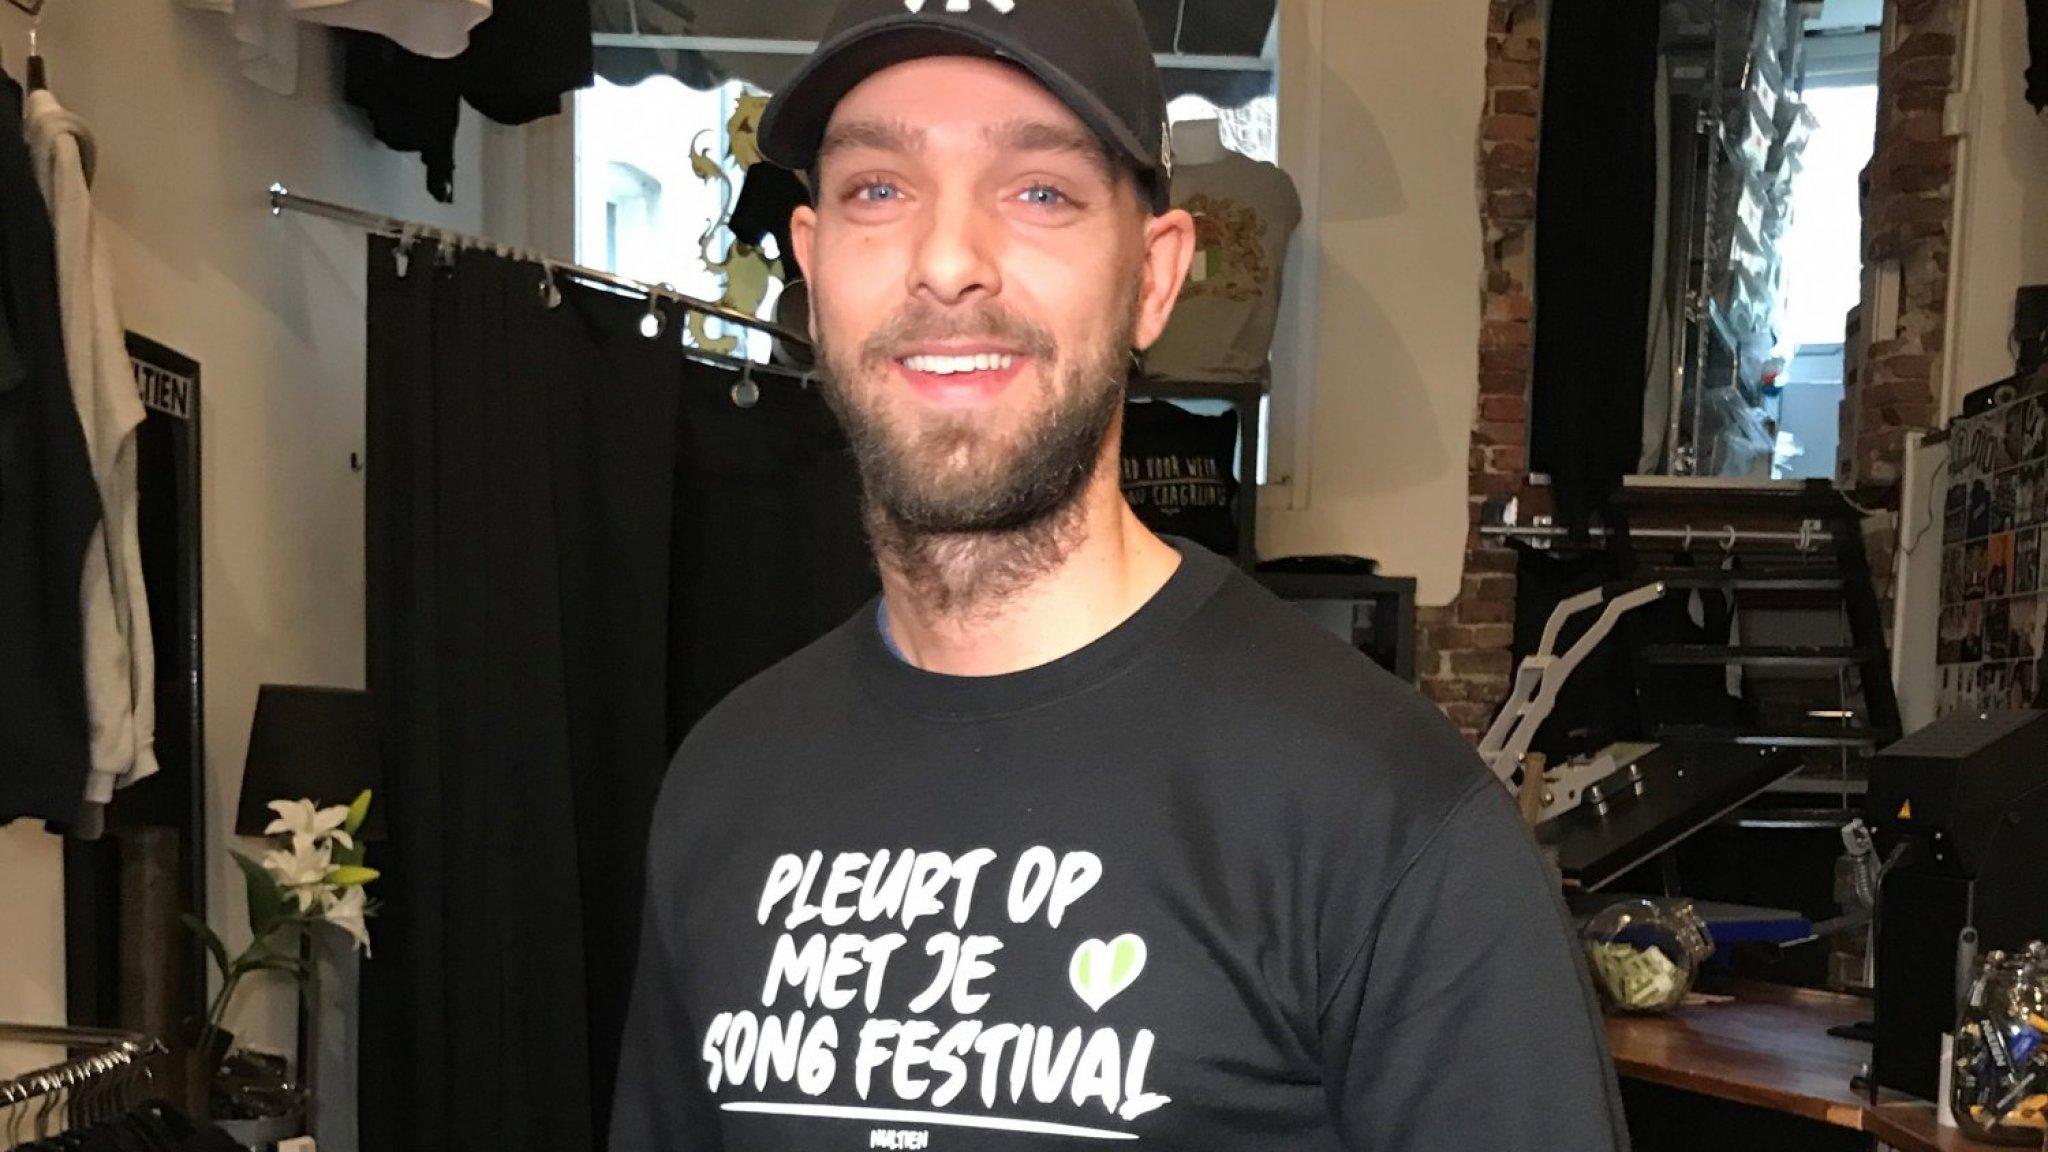 Guy verkoopt anti-songfestivalkleding: 'Pleurt op met je songfestival'